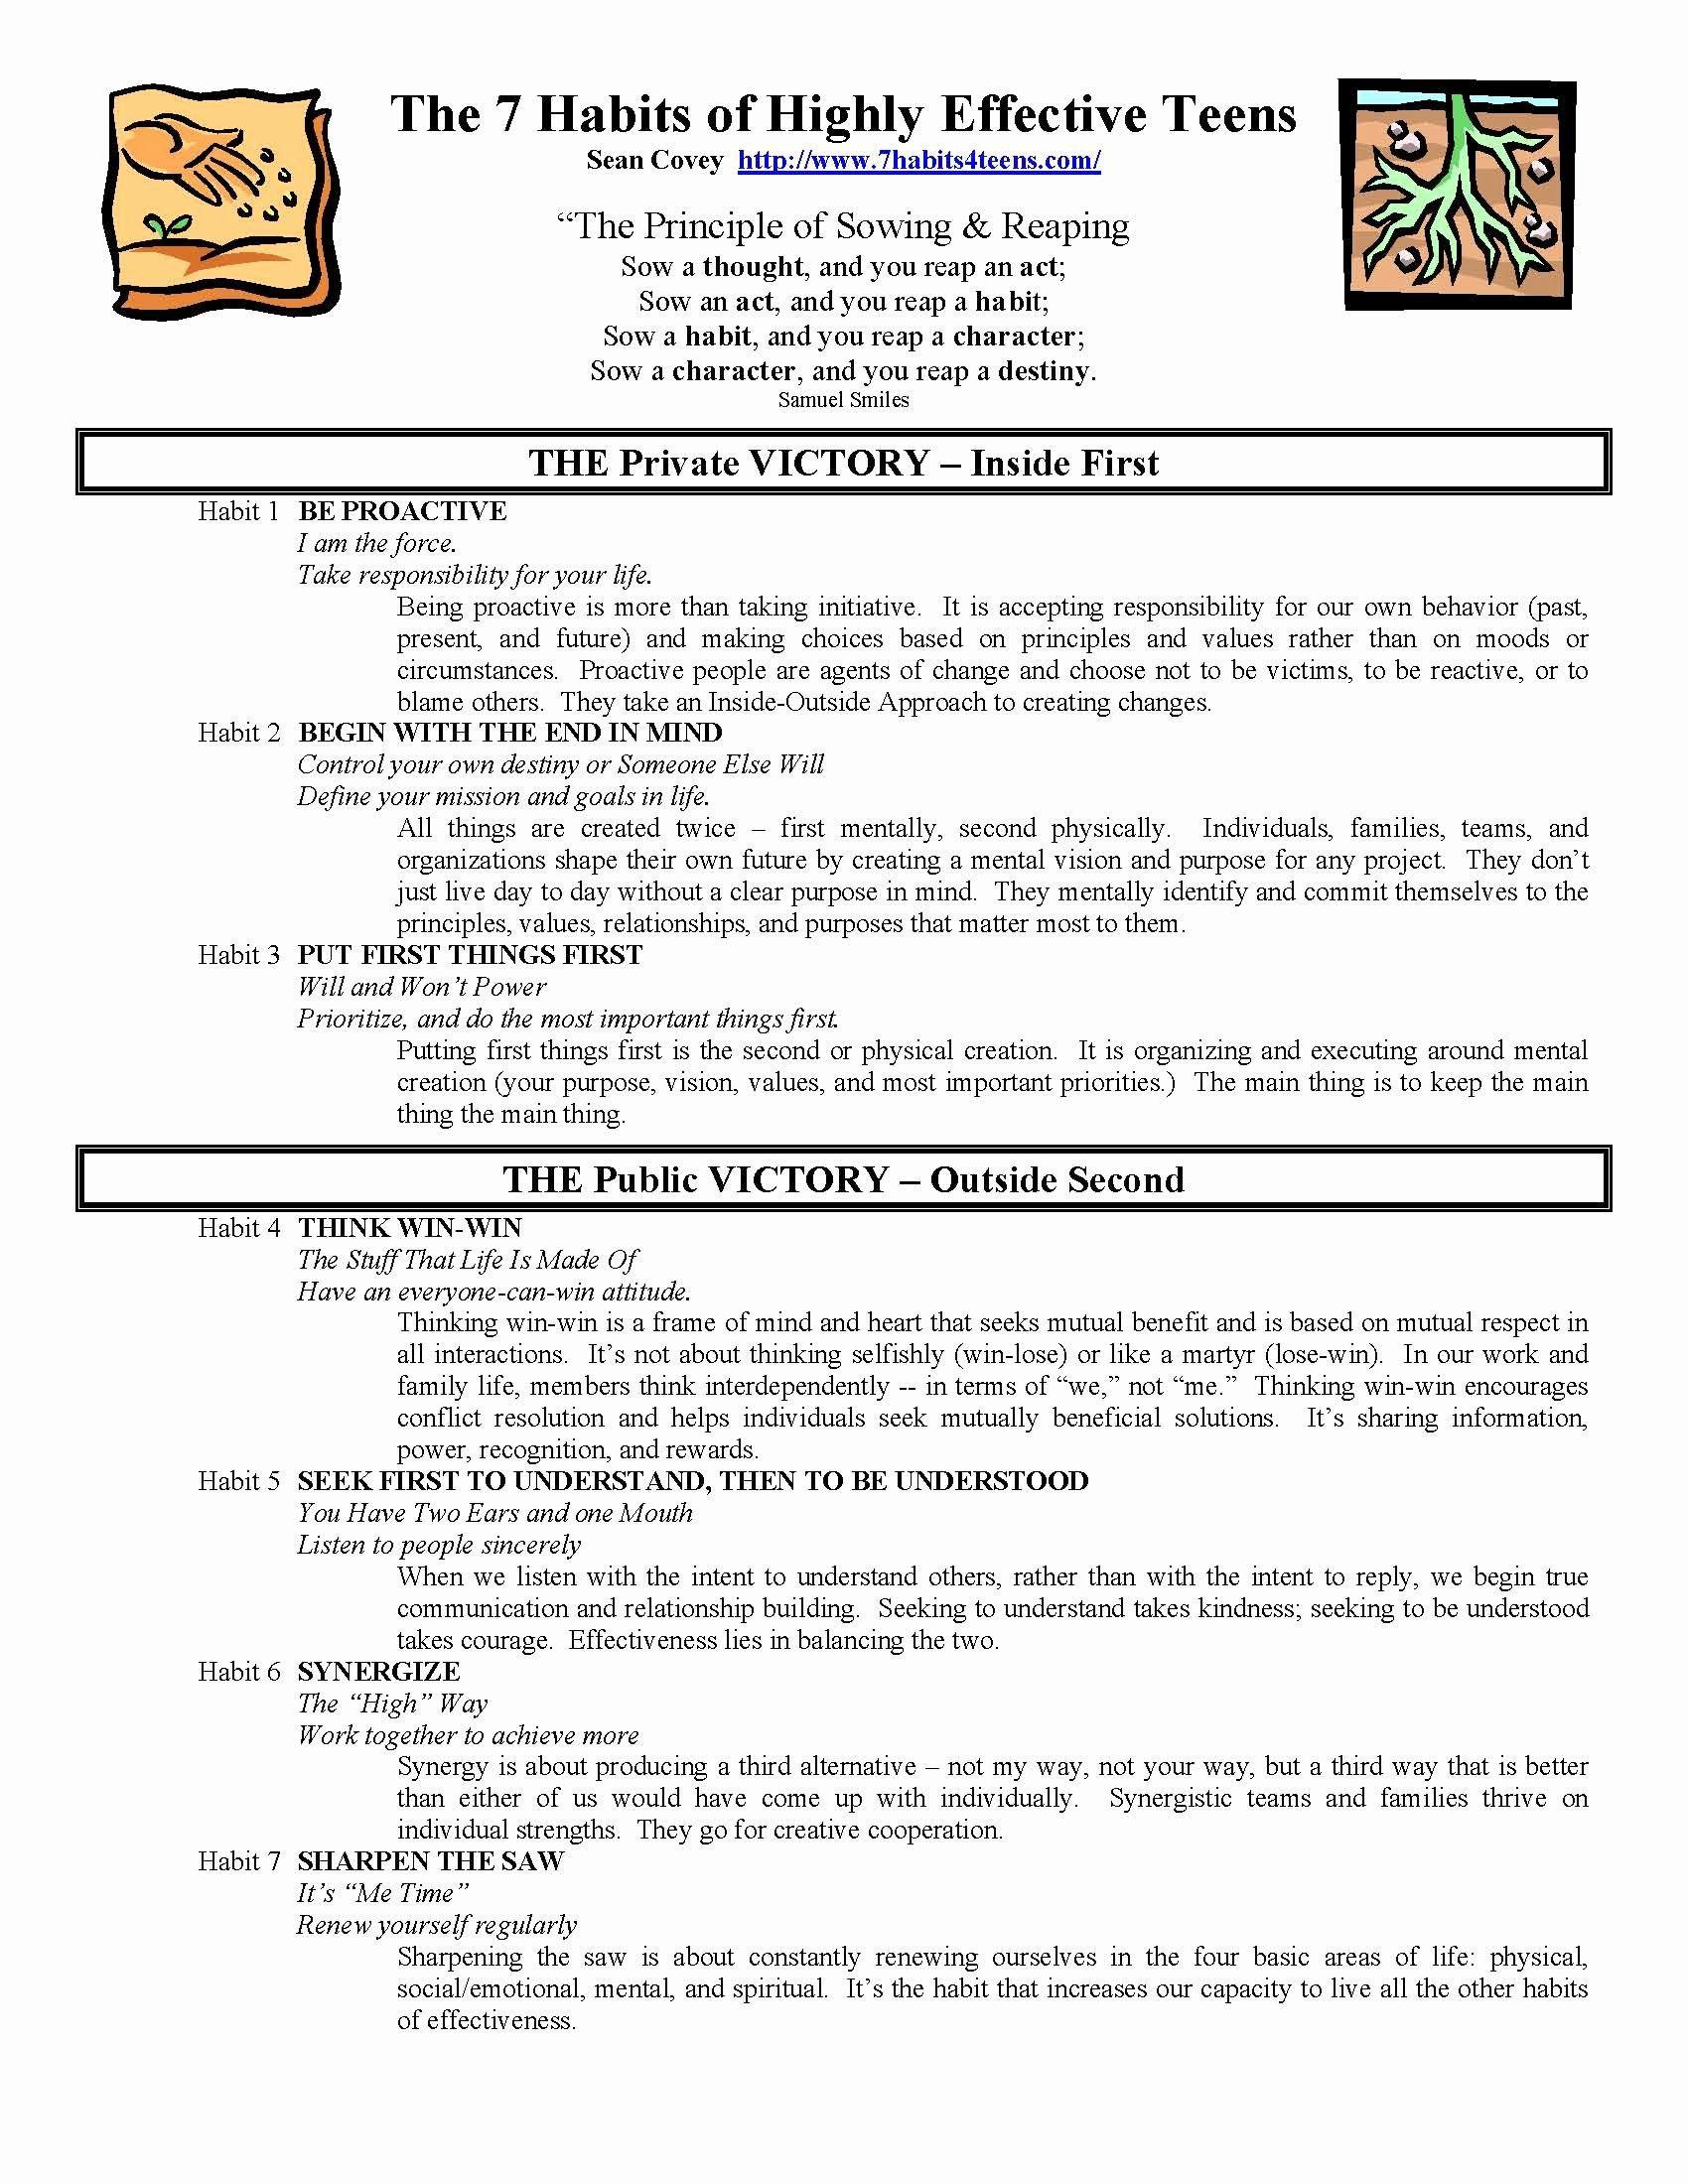 7 Habits Worksheet Pdf 50 7 Habits Worksheet Pdf In 2020